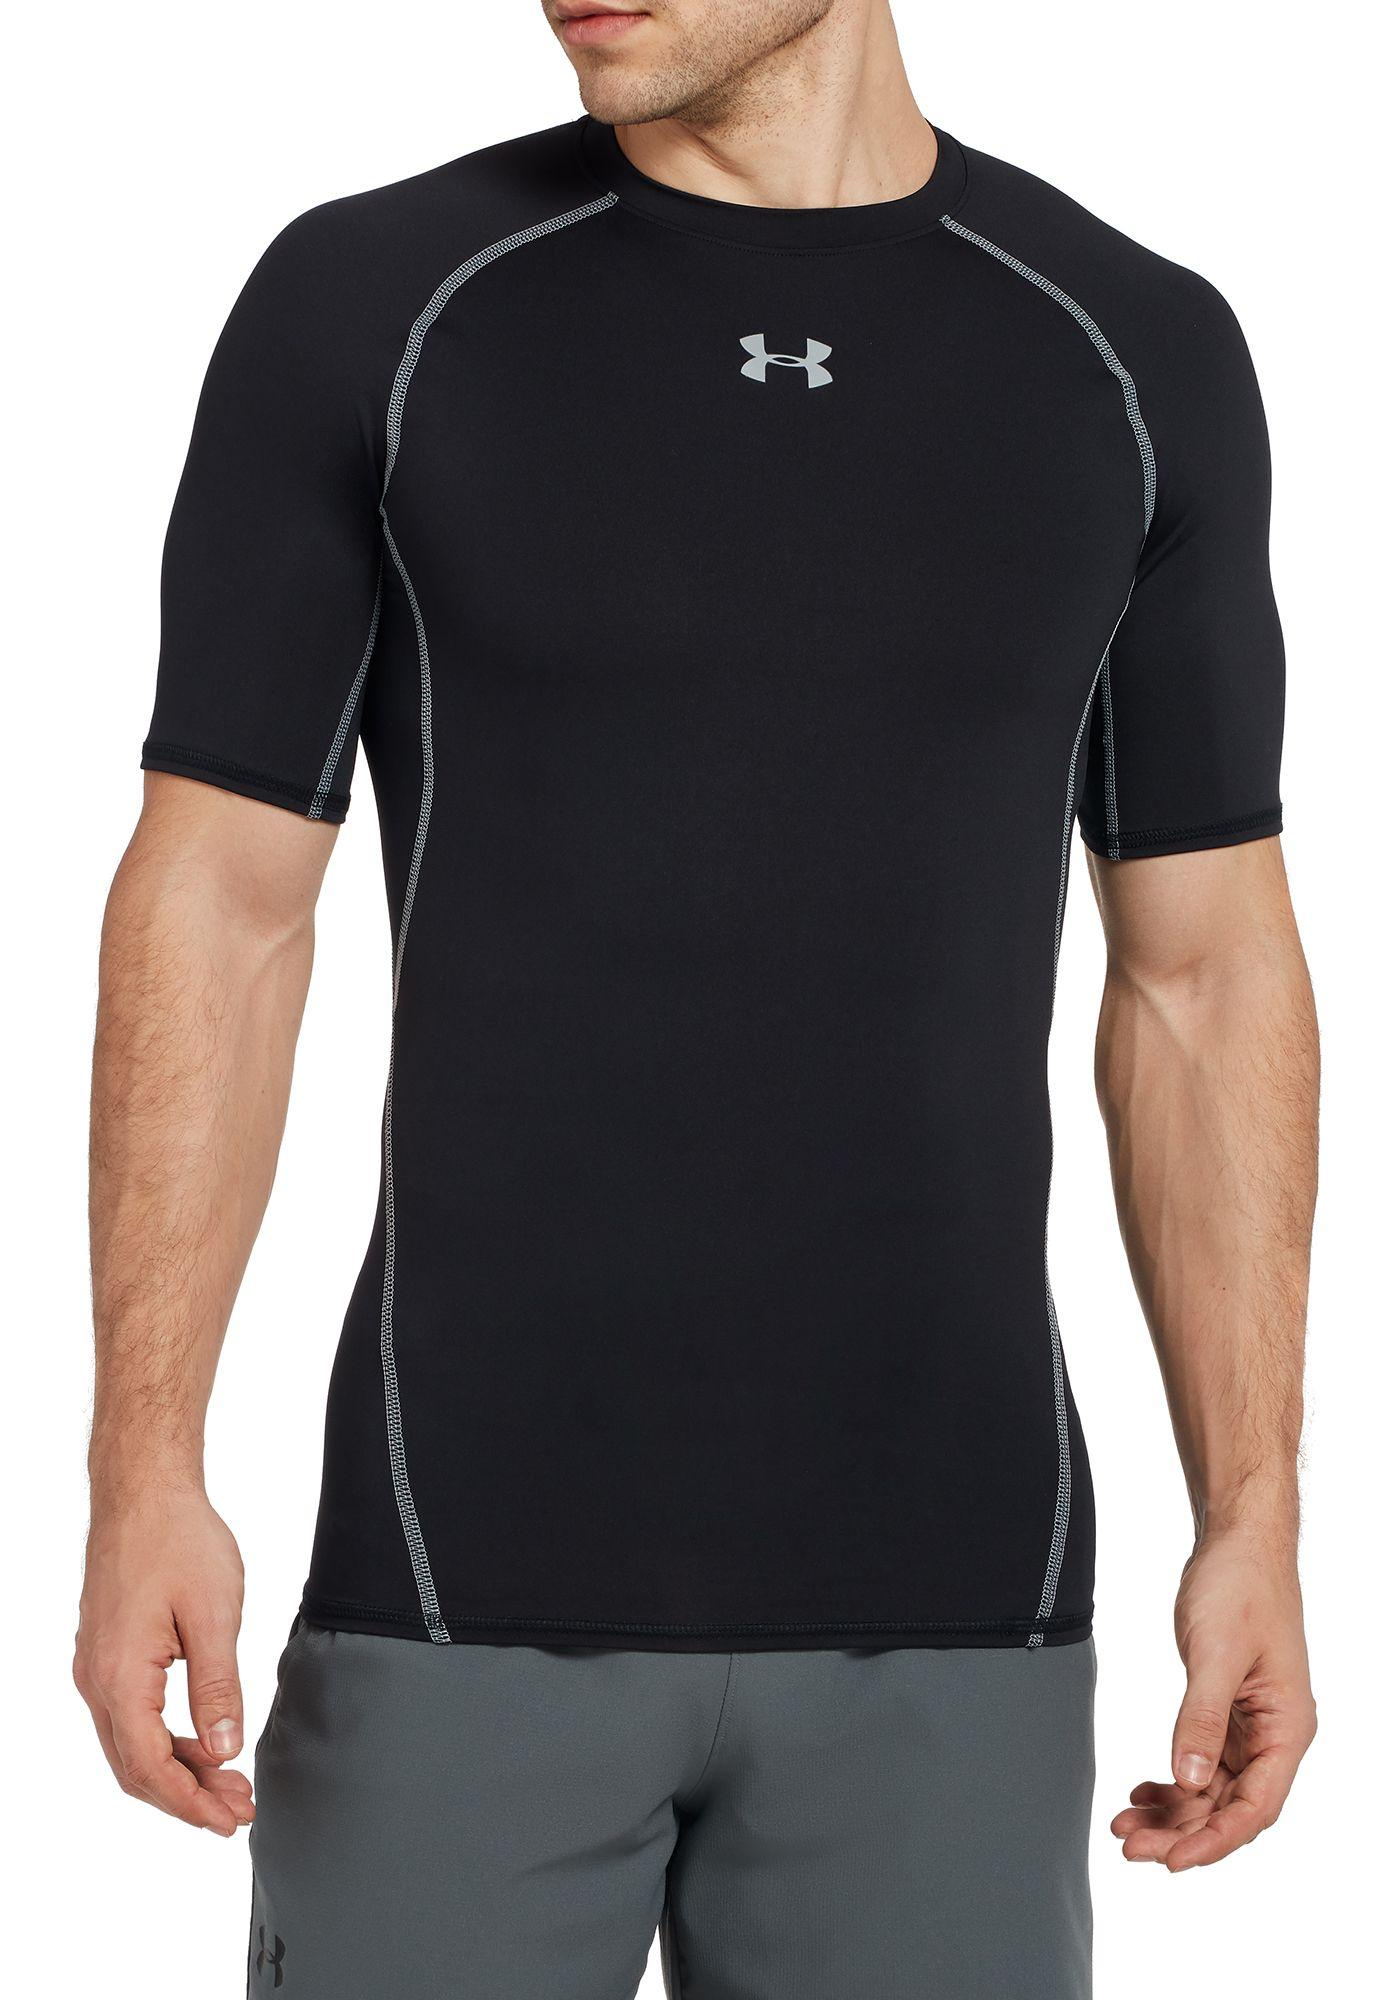 Under Armour Men's HeatGear Armour T-Shirt (Regular and Big & Tall)